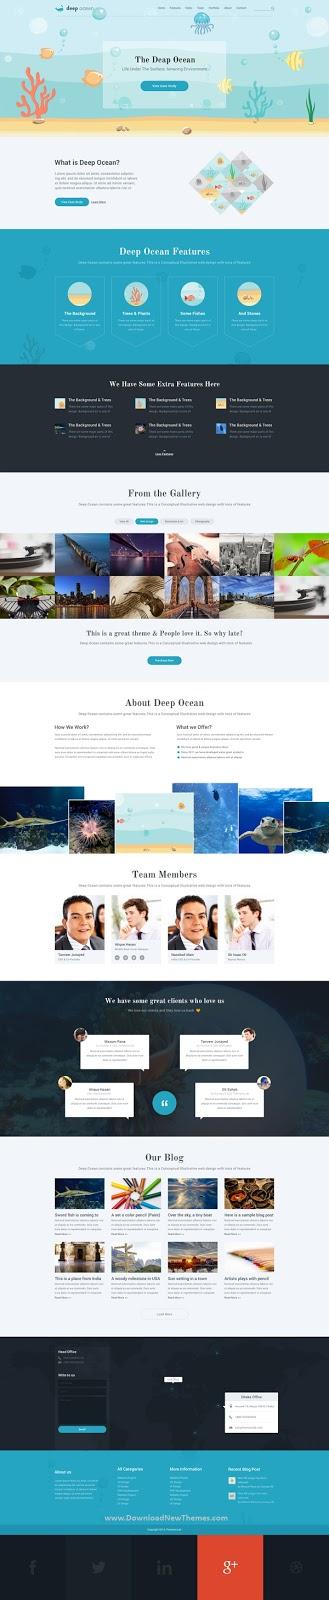 Single Page PSD Template